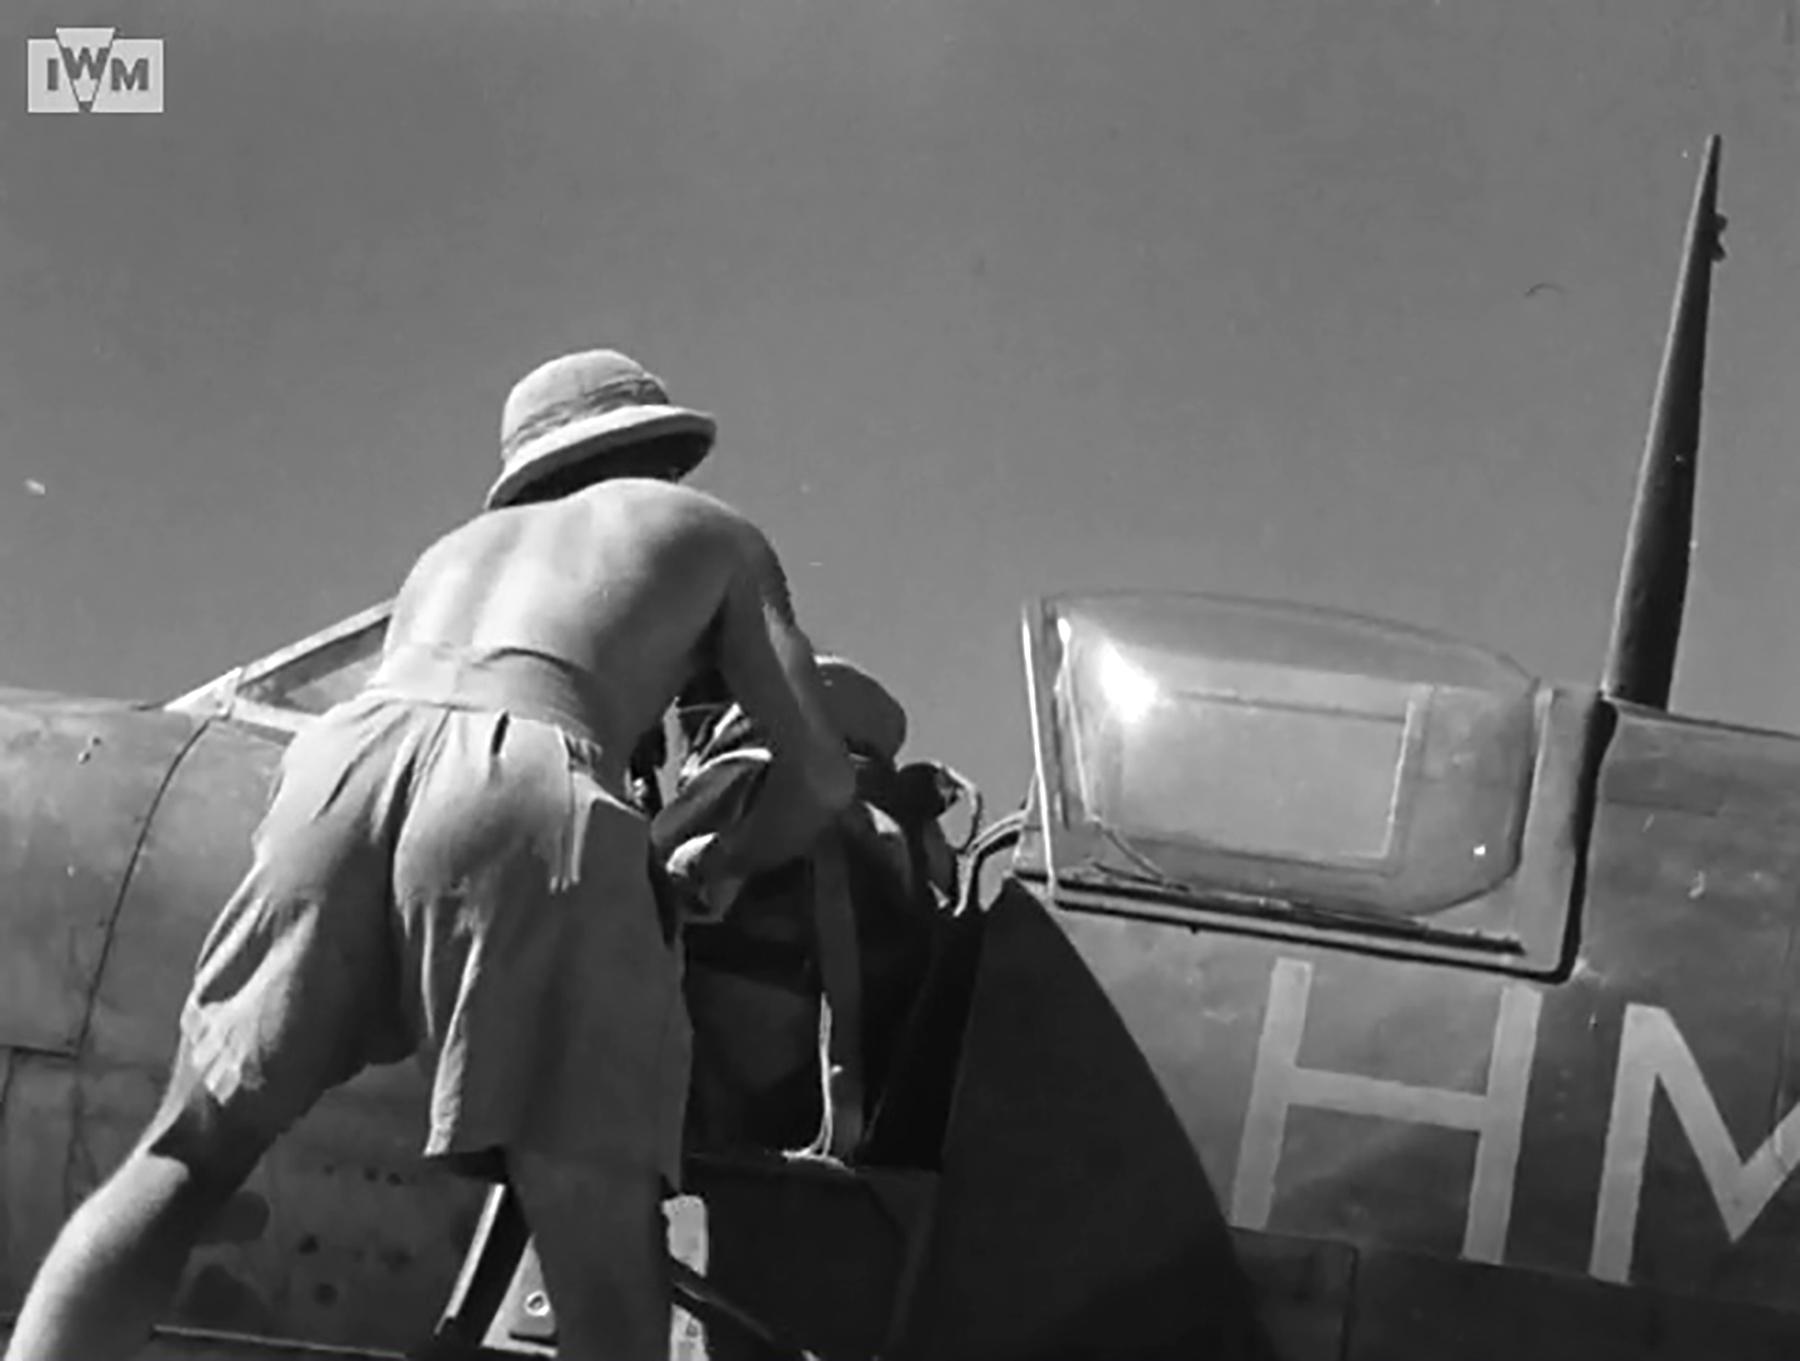 Spitfire VIII RAF 136Sqn pilot being strapped in before taking off from Rumkhapalong Bangladesh CBI 1944 IWM 01